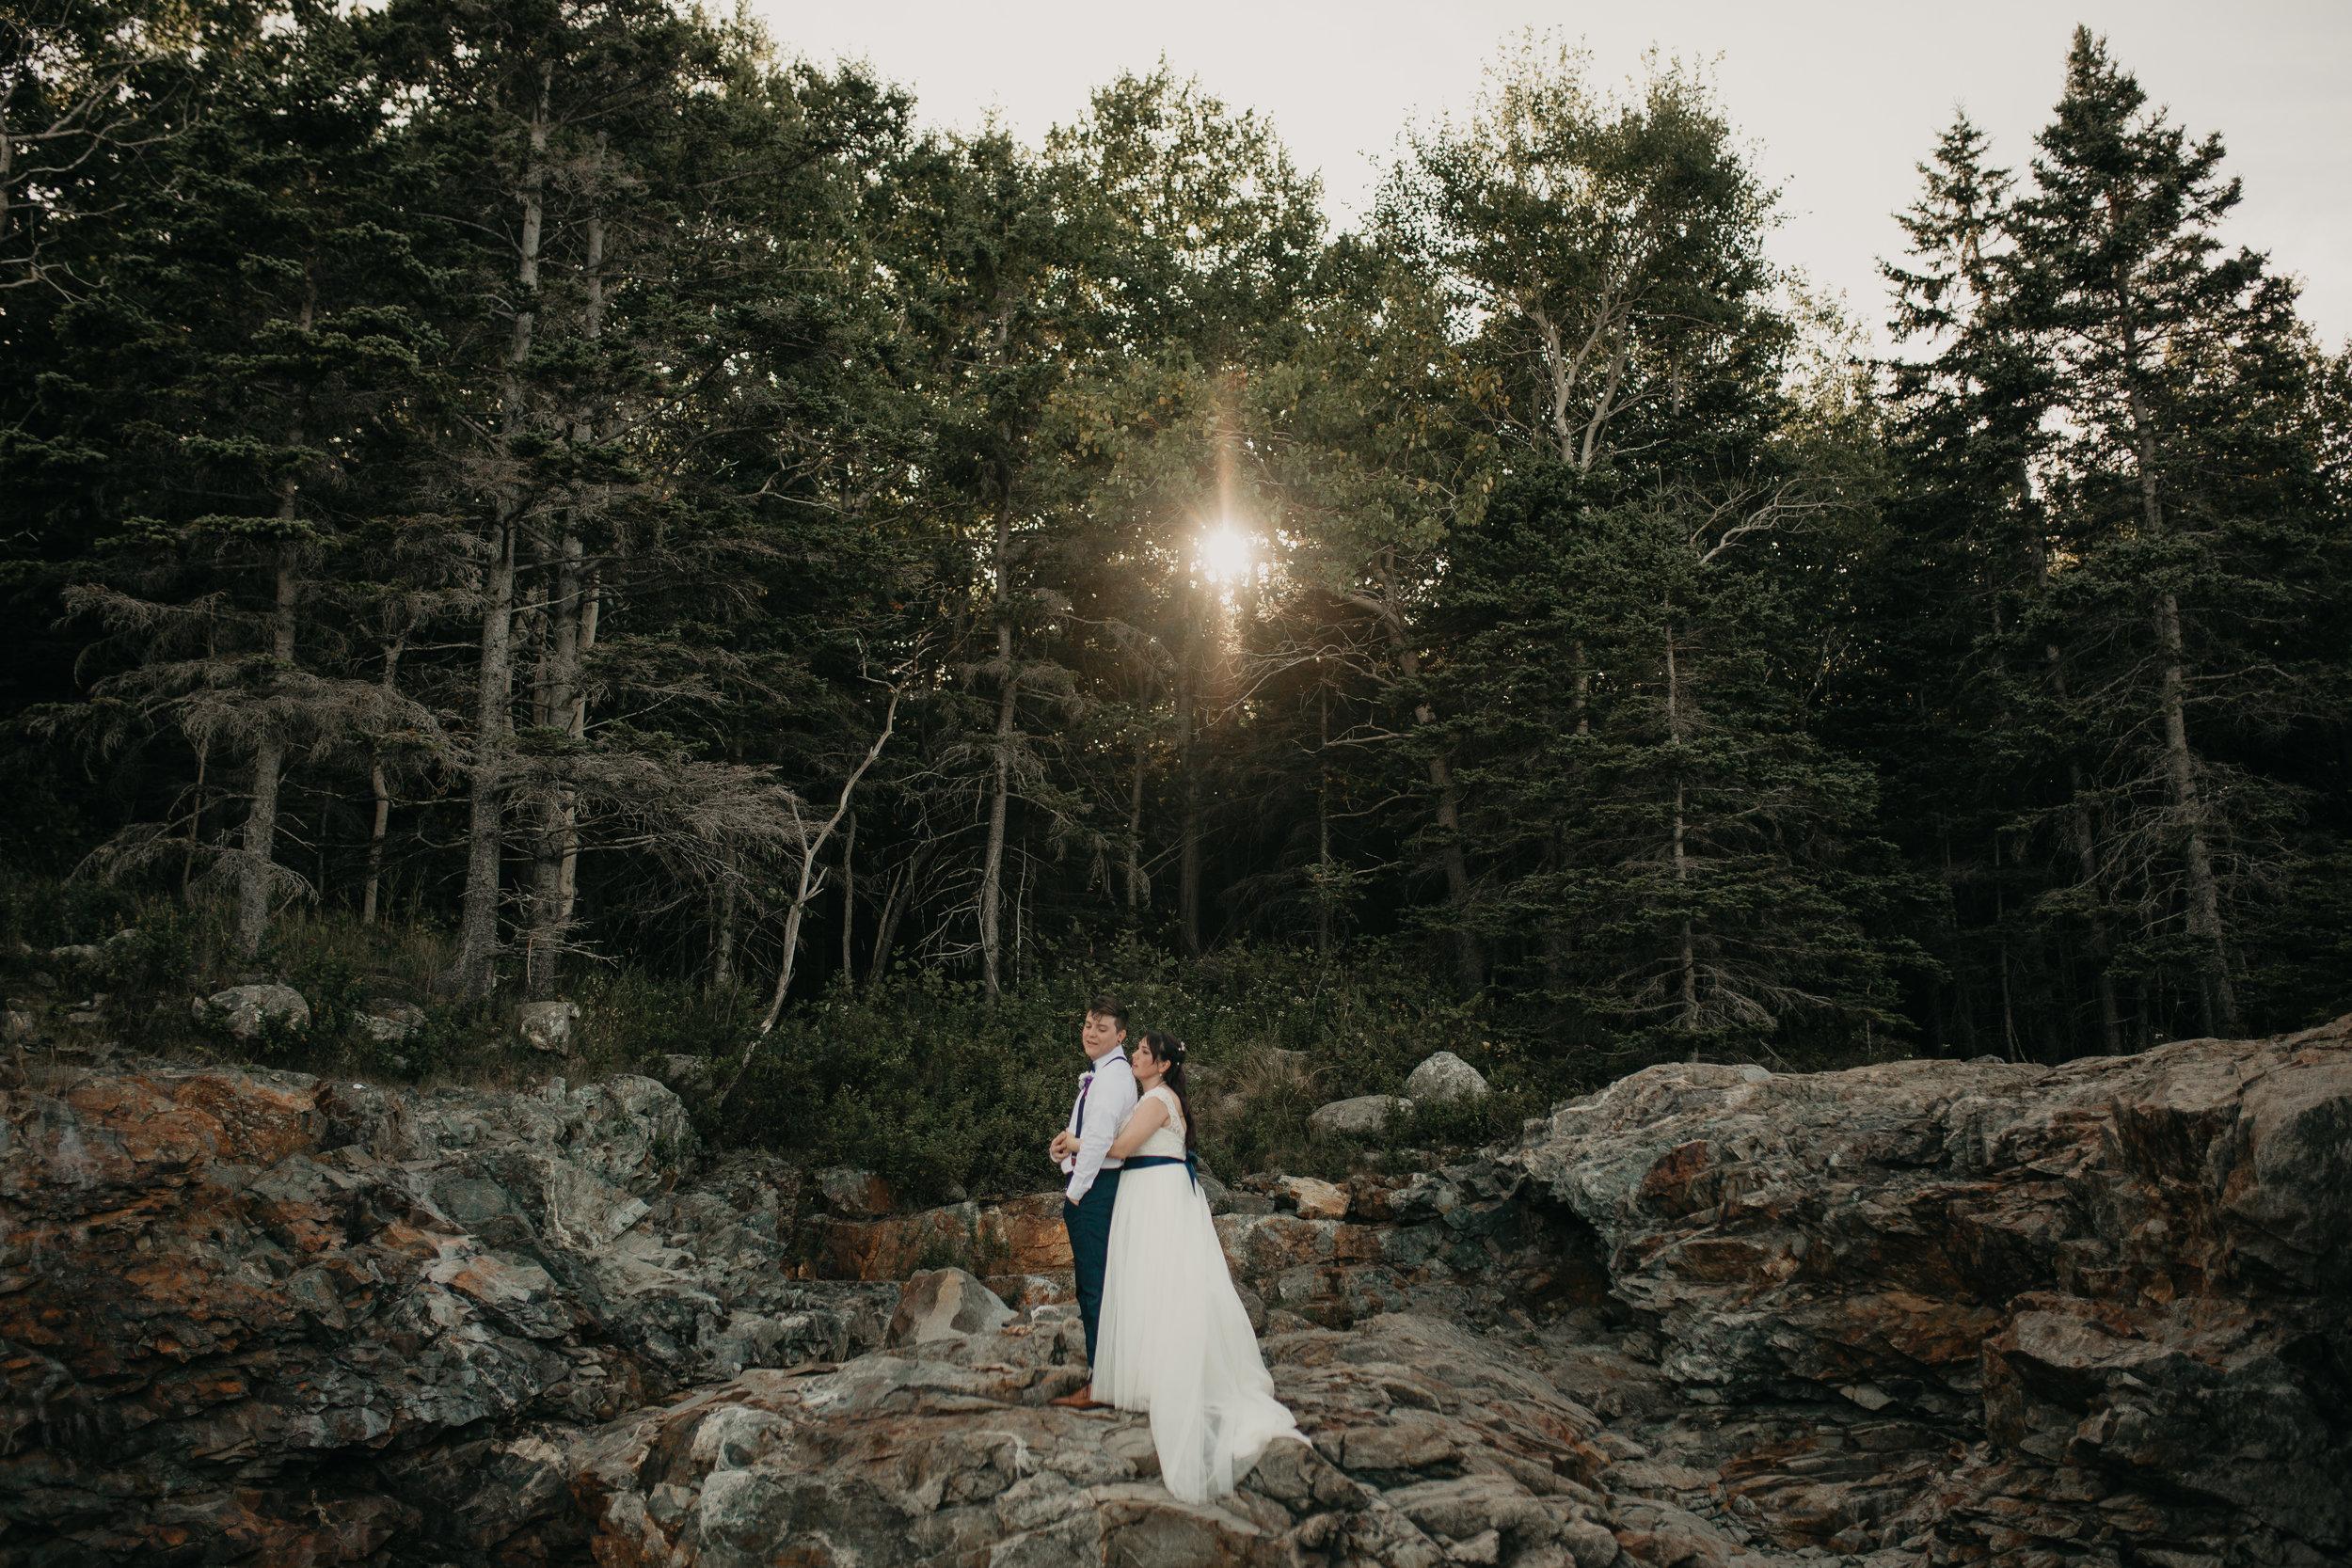 nicole-daacke-photography-Elopement-rocky-shoreline-coast-Acadia-National-Park-elopement-photographer-inspiration-maine-elopement-otter-cliffs-schoonic-head-point-36.jpg